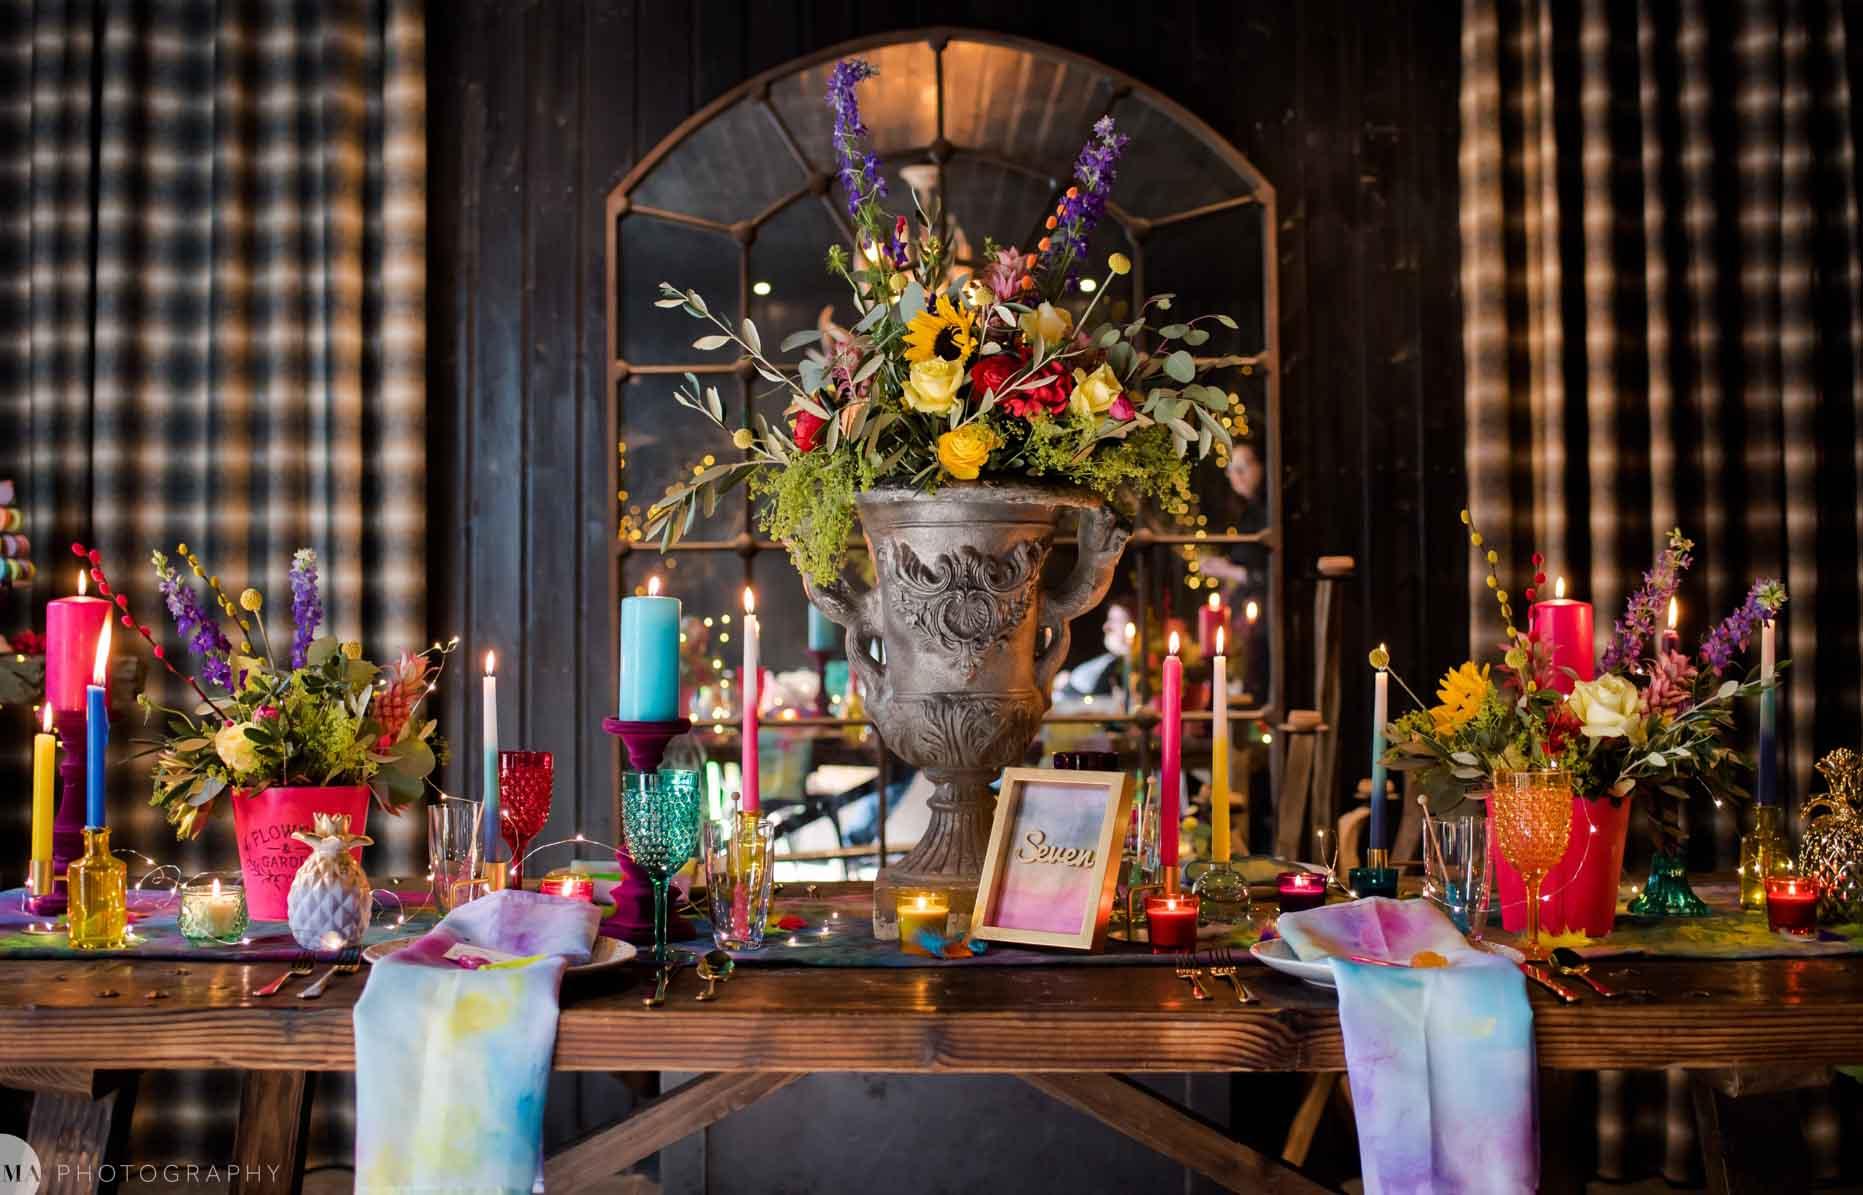 1. The Wedding Alchemist - alternative wedding styling - unconventional wedding